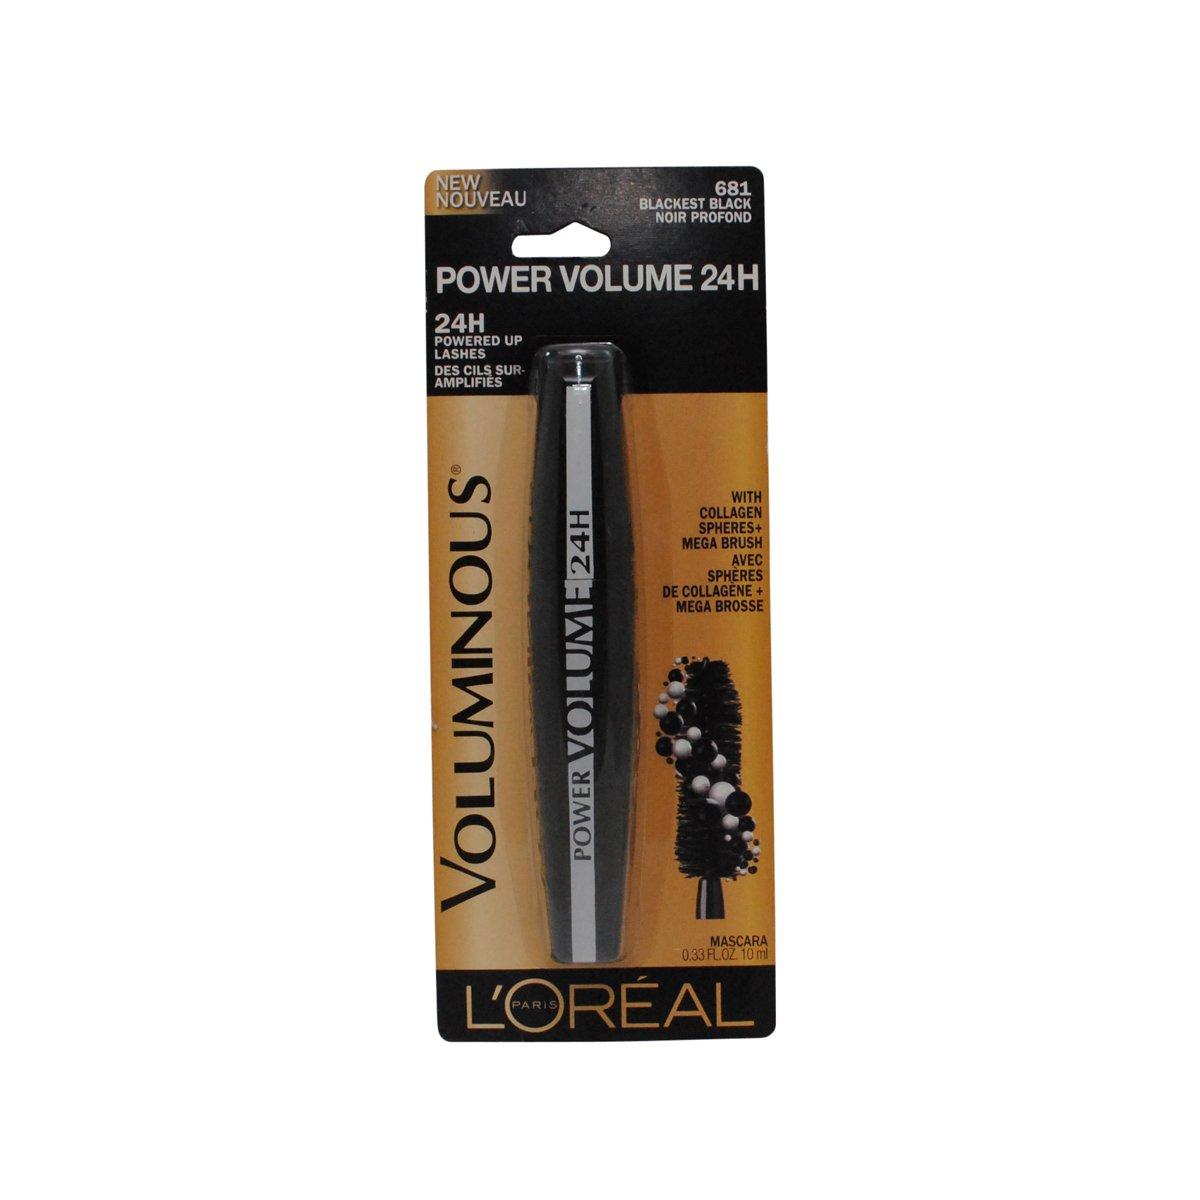 81256408761 Amazon.com : L'Oreal Paris Voluminous Power Volume 24H Mascara, 681  Blackest Black, 0.33 Fluid ounce : Beauty